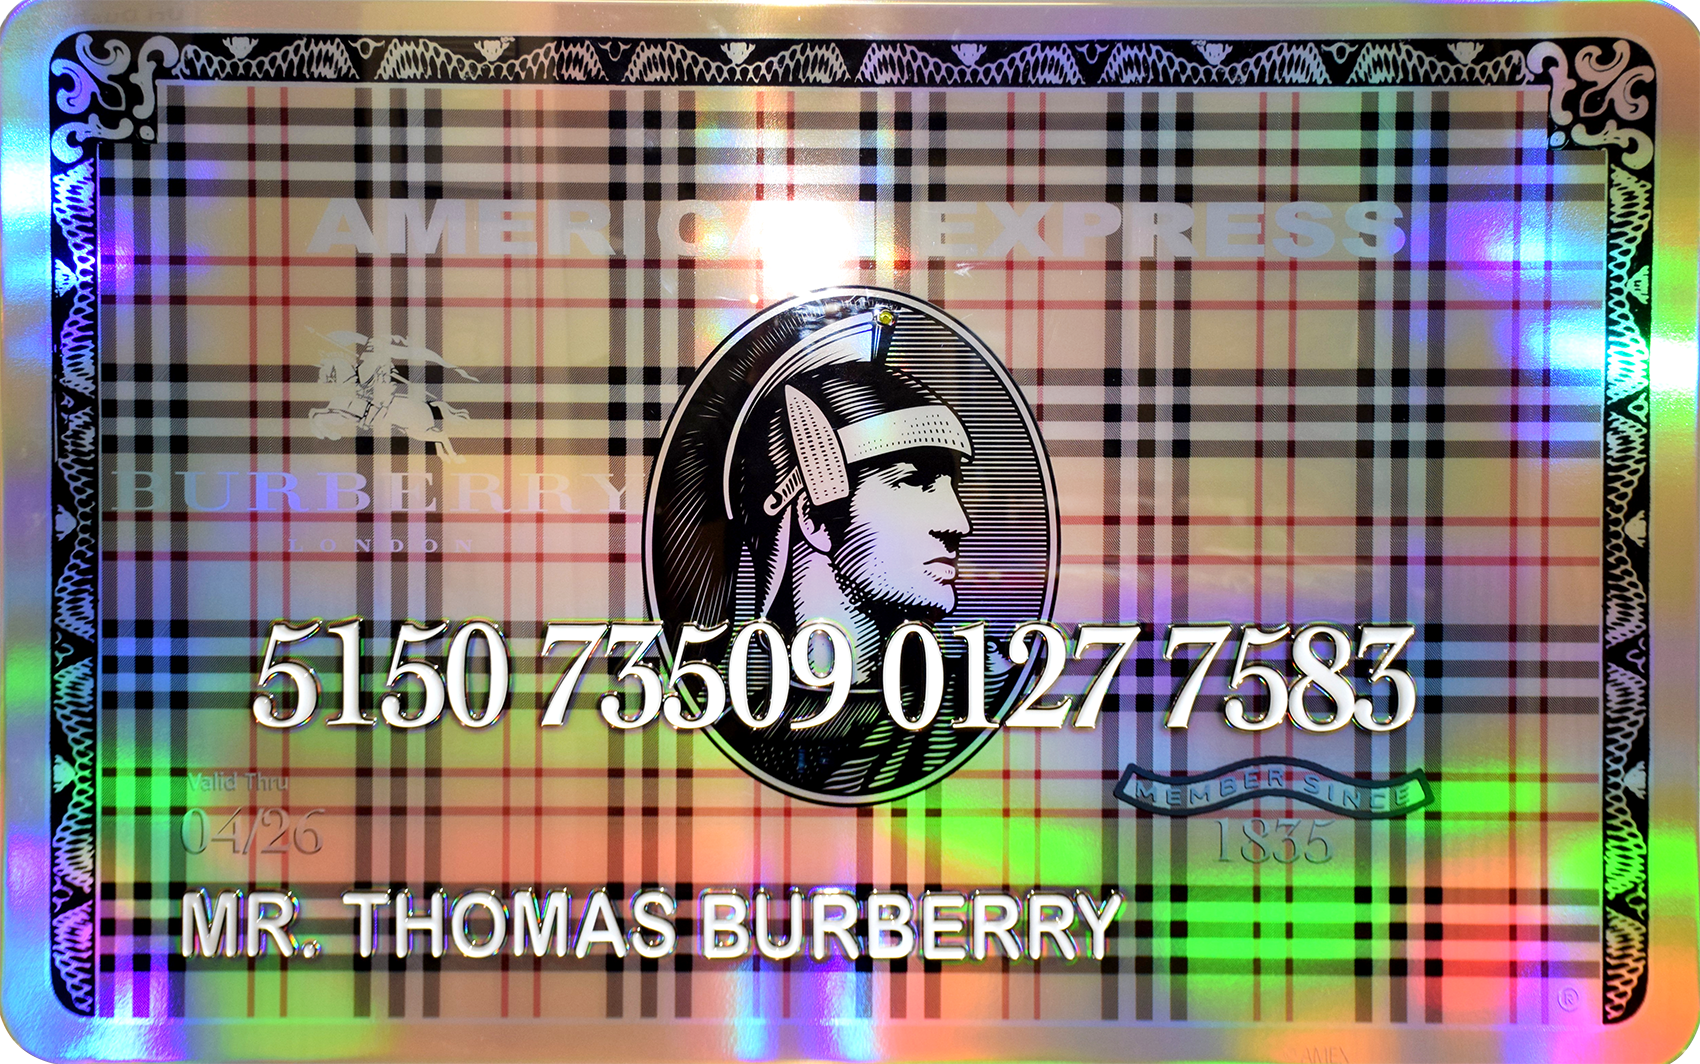 Diederik - AMEX (Mr. Thomas Burberry) , 4504-016-282